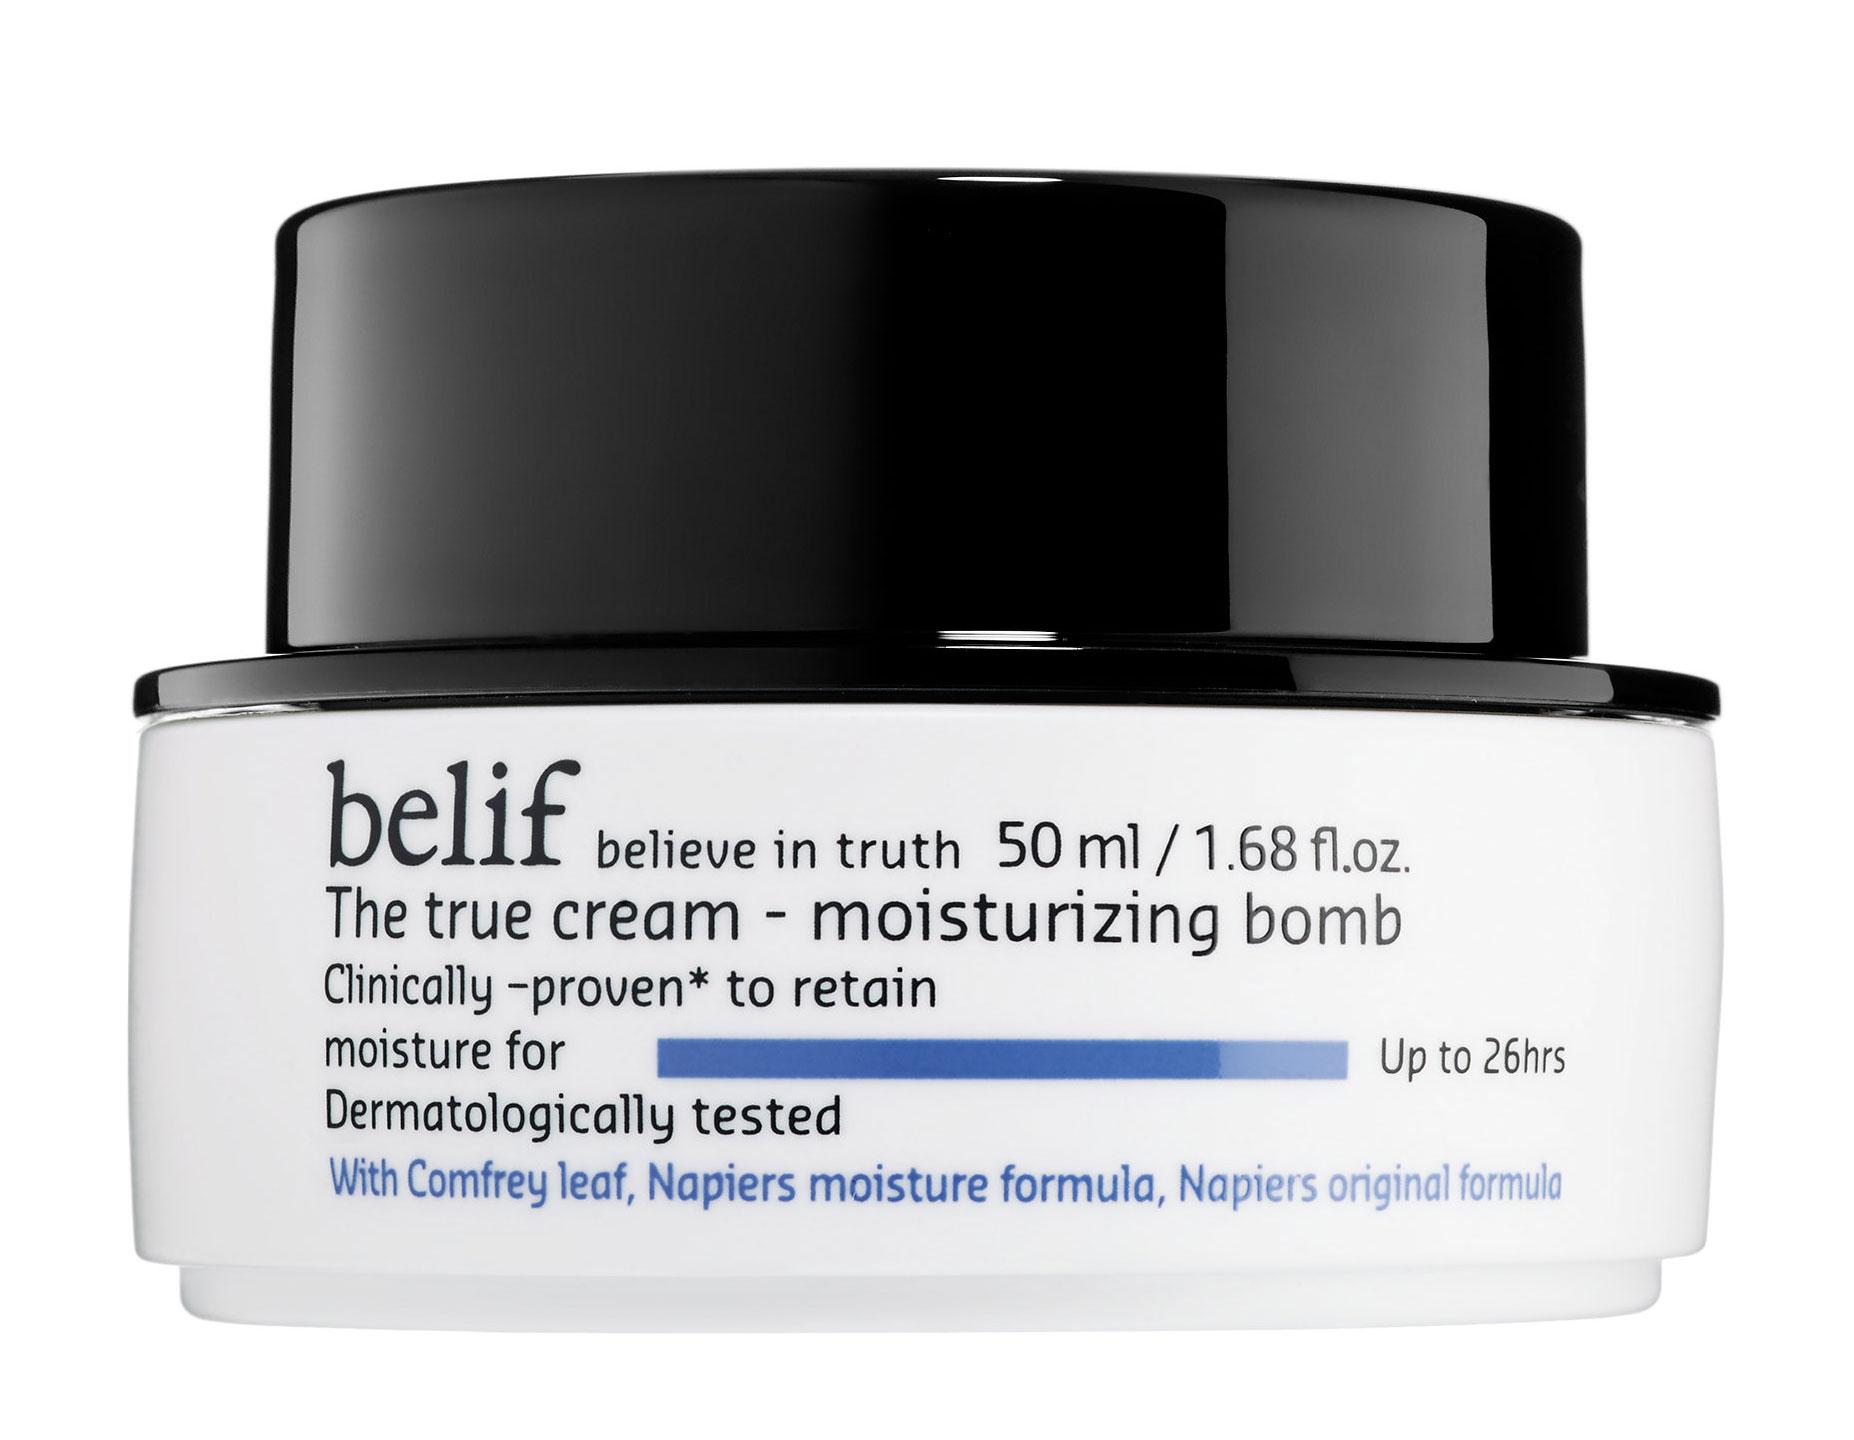 belif-the-true-cream-moisture-bomb